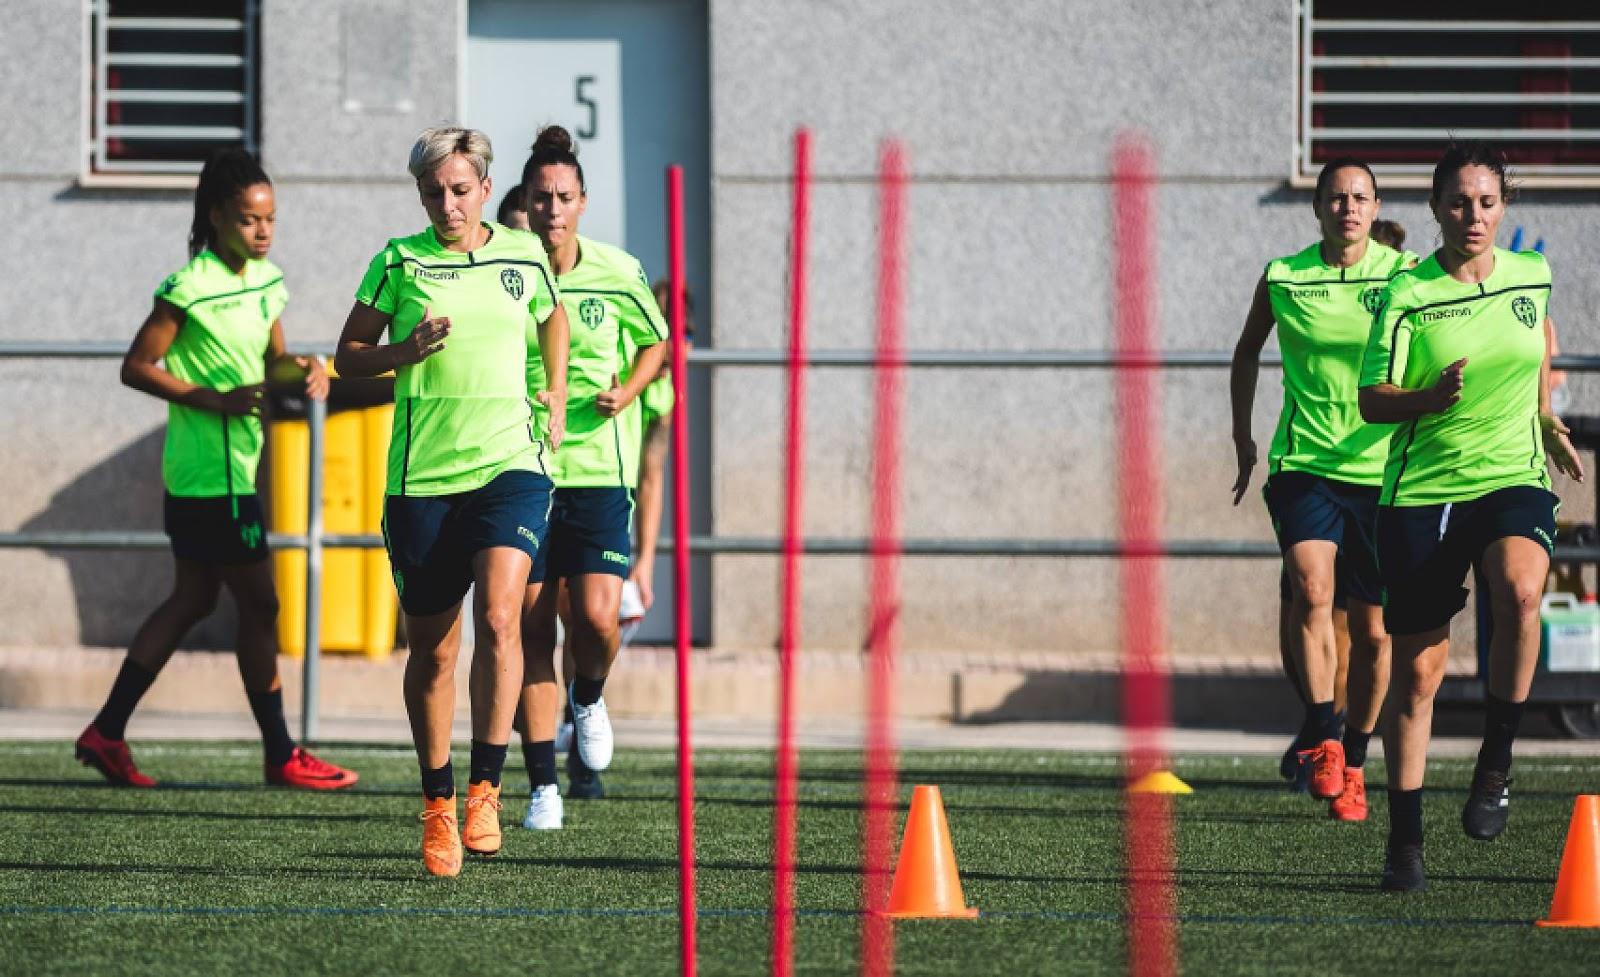 Liga Iberdrola Calendario.Calendario De Liga Iberdrola 2018 19 Para El Levante Ud Femenino